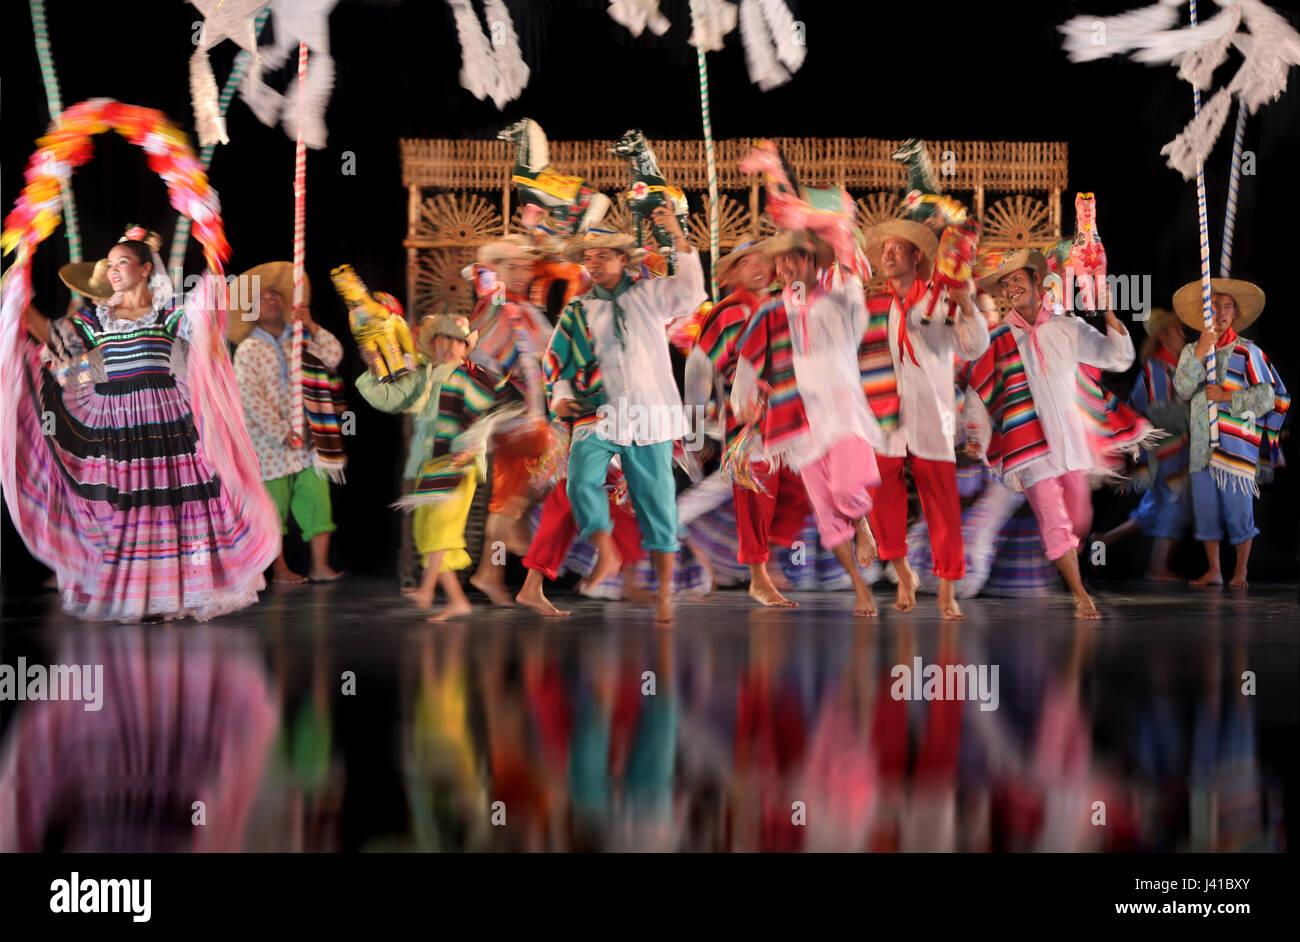 Dancers in a show wearing colourful costumes, culture, entertainment, Villa Escudero, Manila, Luzon, Philippines, - Stock Image